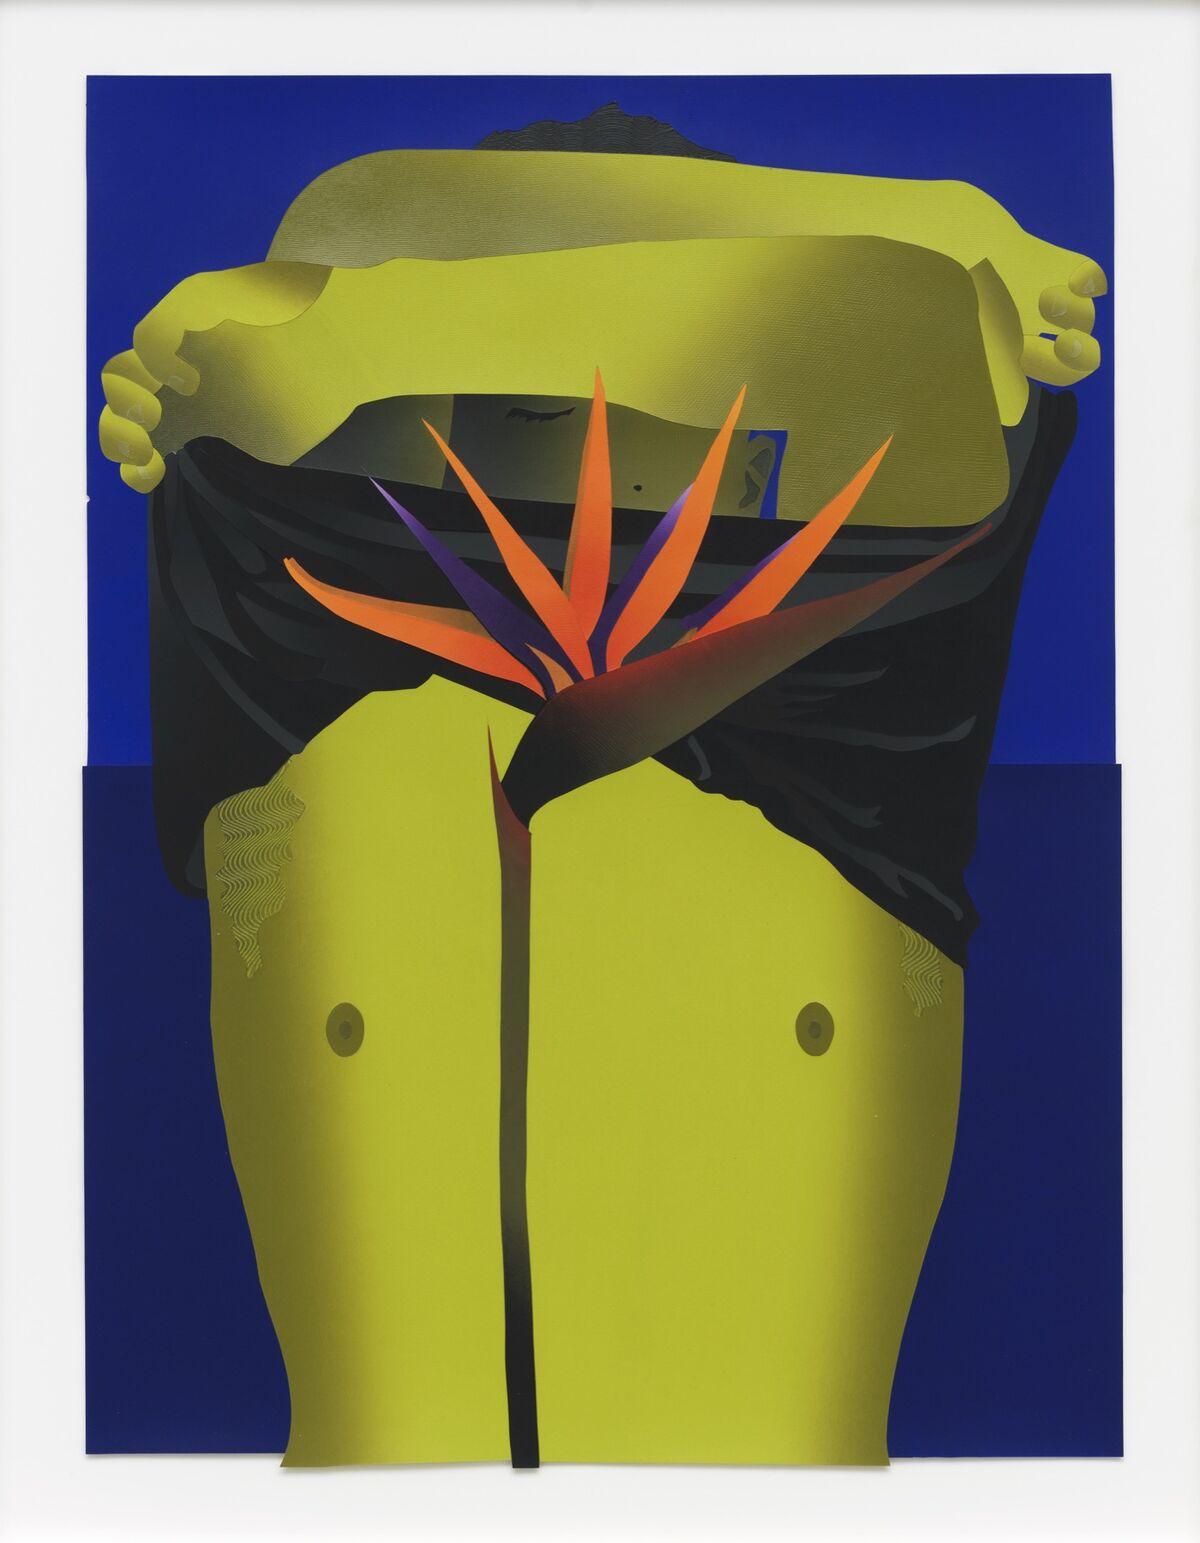 Anthony Lacono, Bird of Paradise, 2018. Courtesy of the artist and Marinaro Gallery.